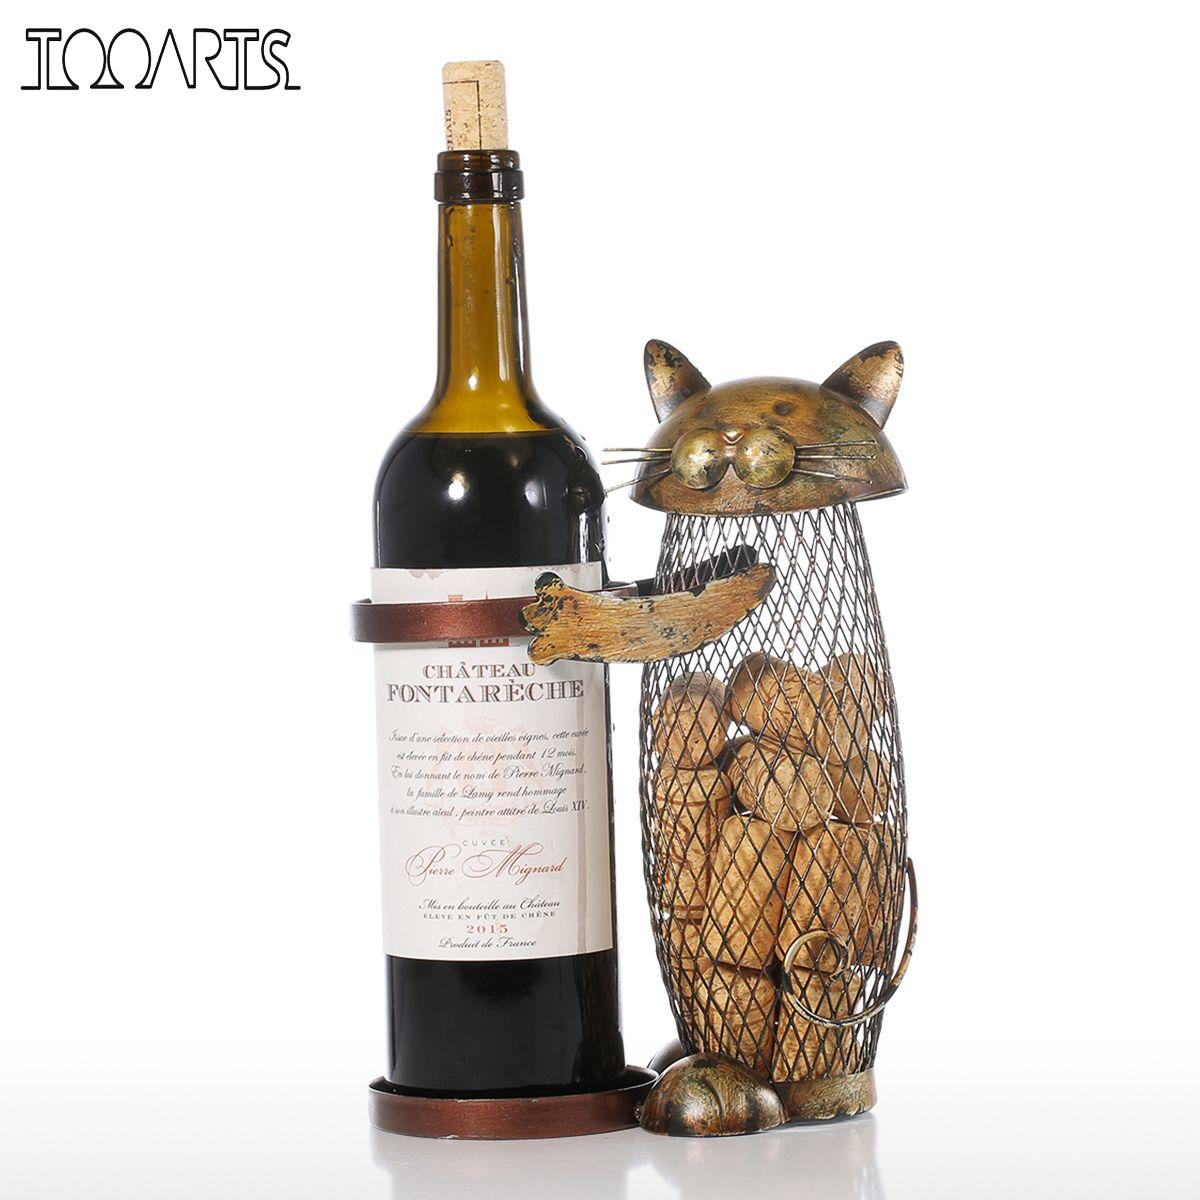 Tooarts Cat Wine Rack Cork Container Bottle Wine Holder Kitchen Bar Metal Wine Craft Christmas Gift Handcraft Animal Wine Stand 10